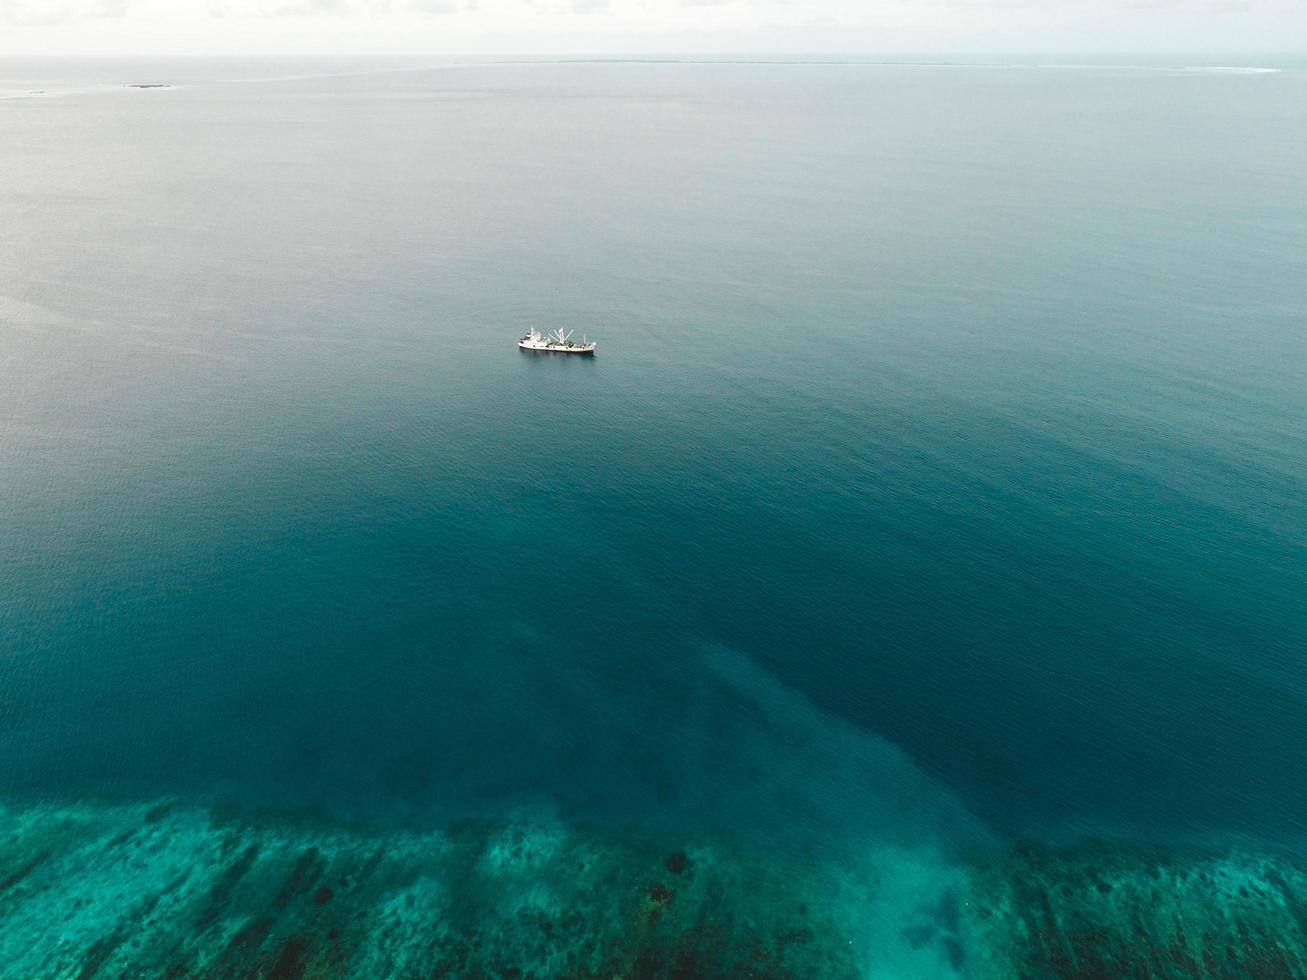 Boat on the sea photo